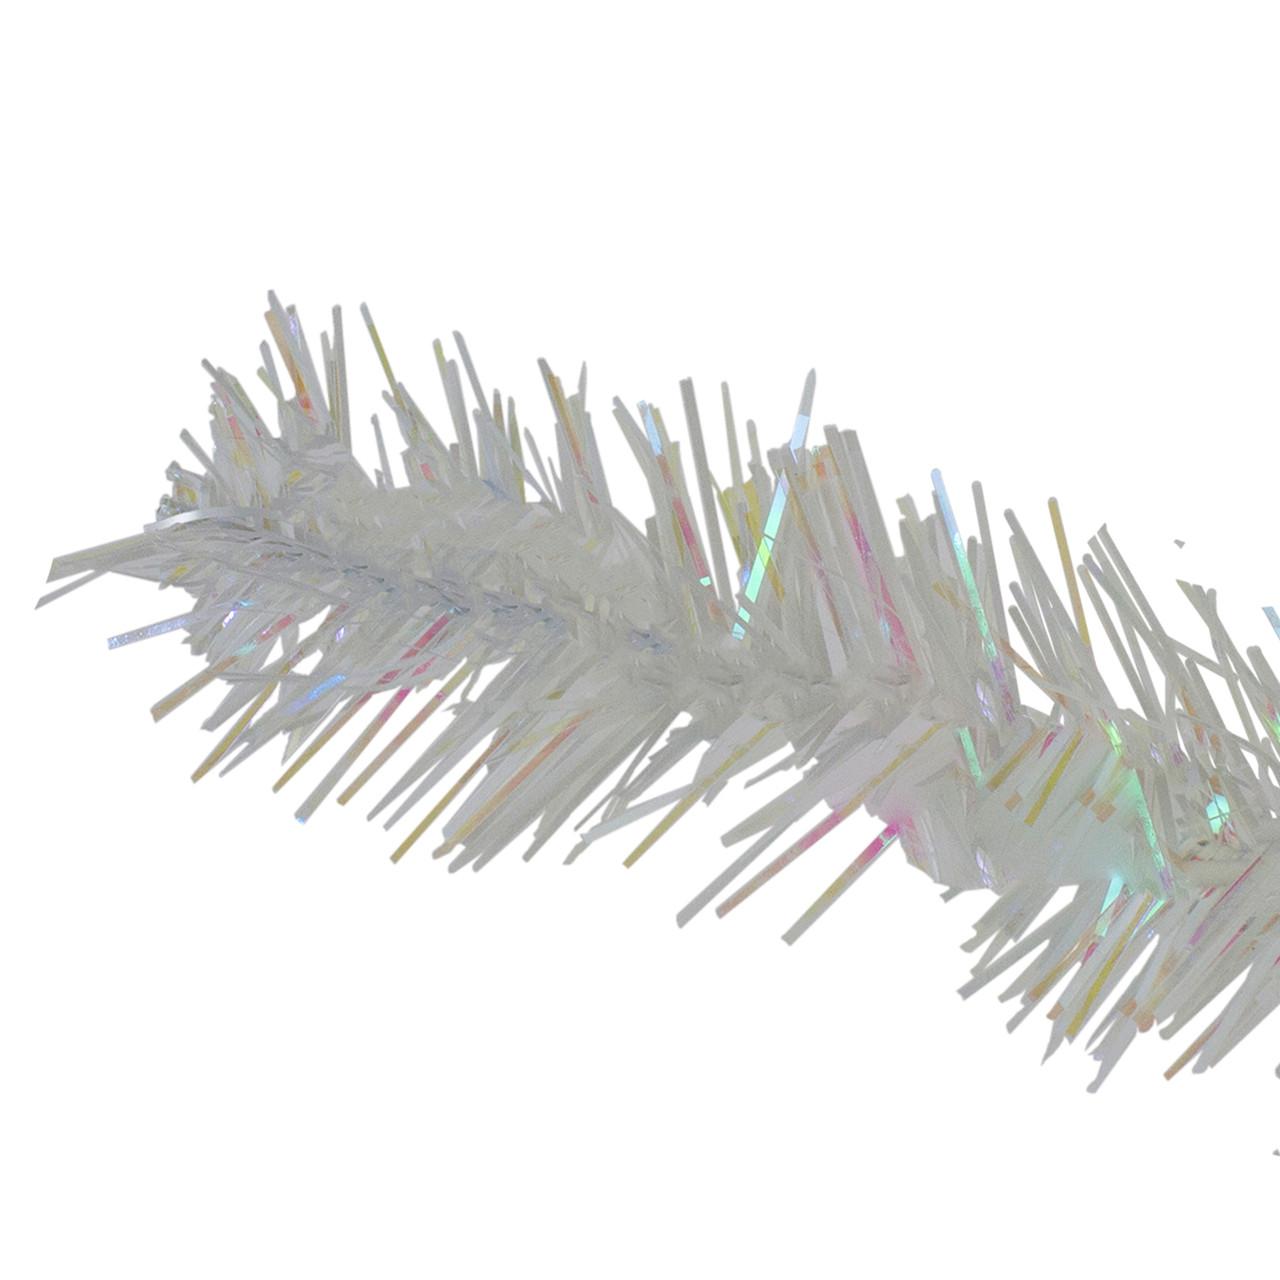 northlight - Christmas Tree Tinsel